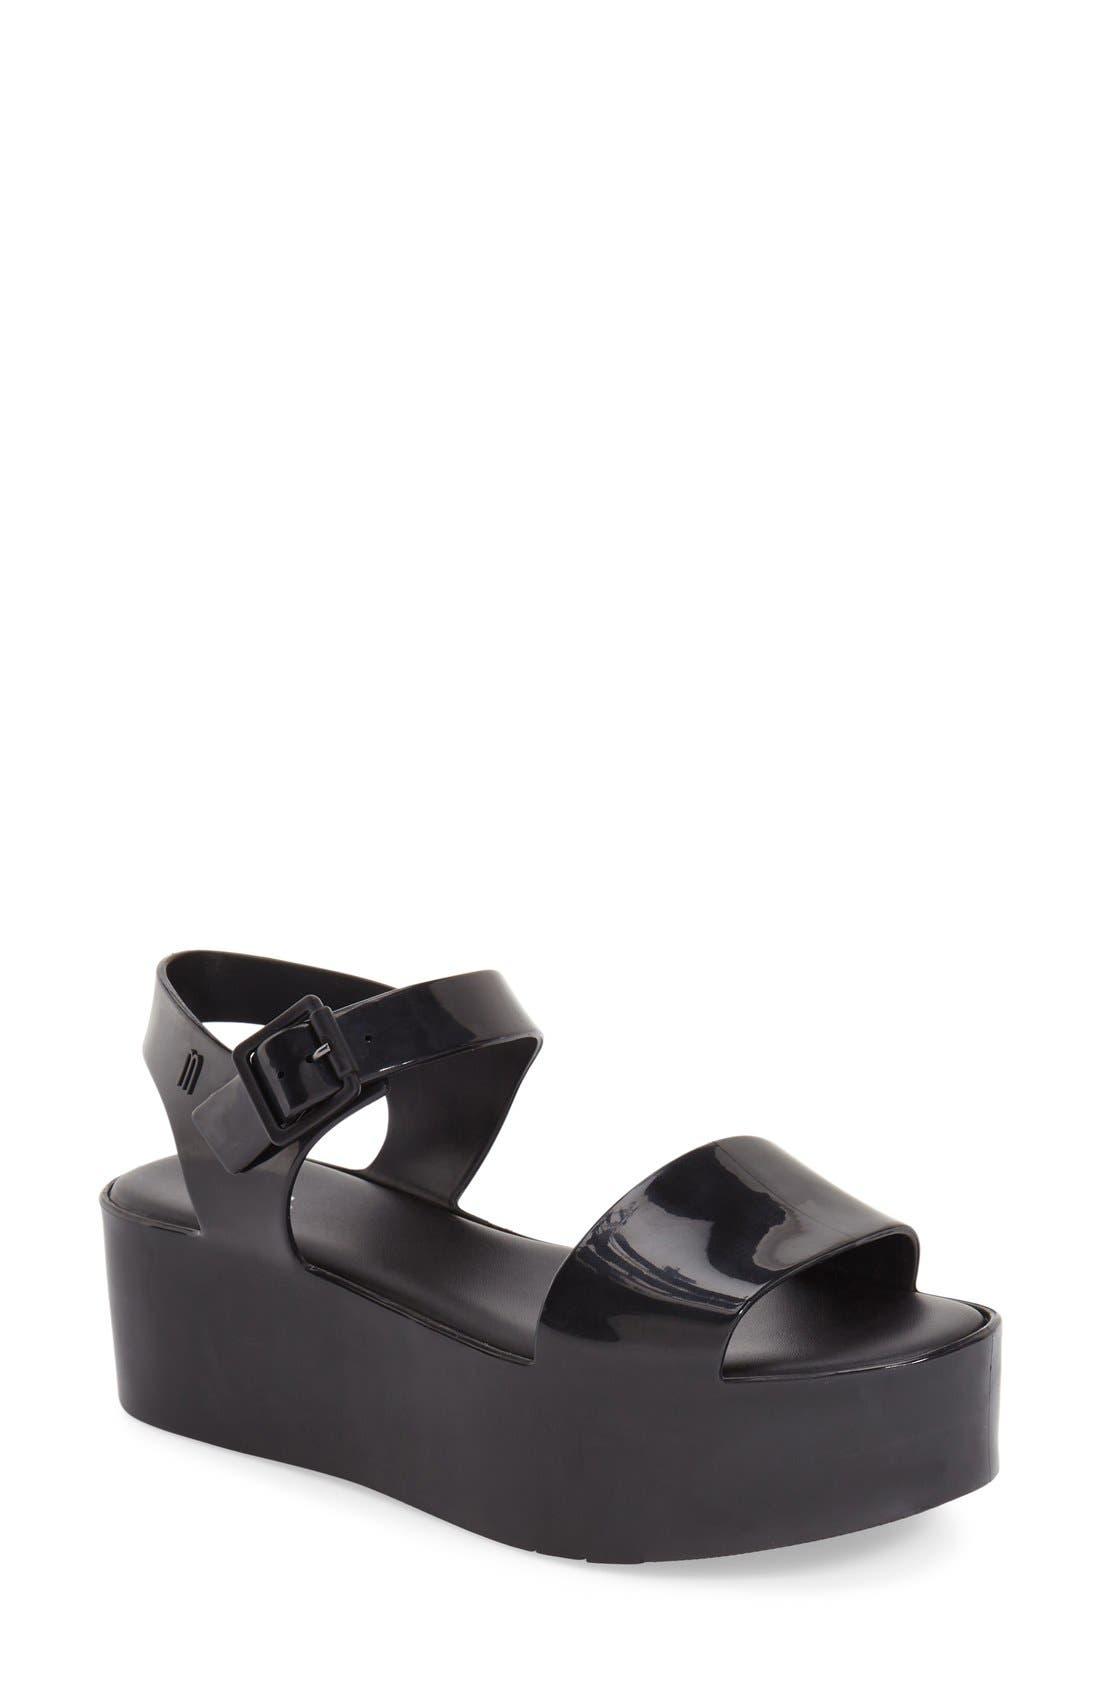 Main Image - Melissa 'Mar' Platform Sandal (Women)